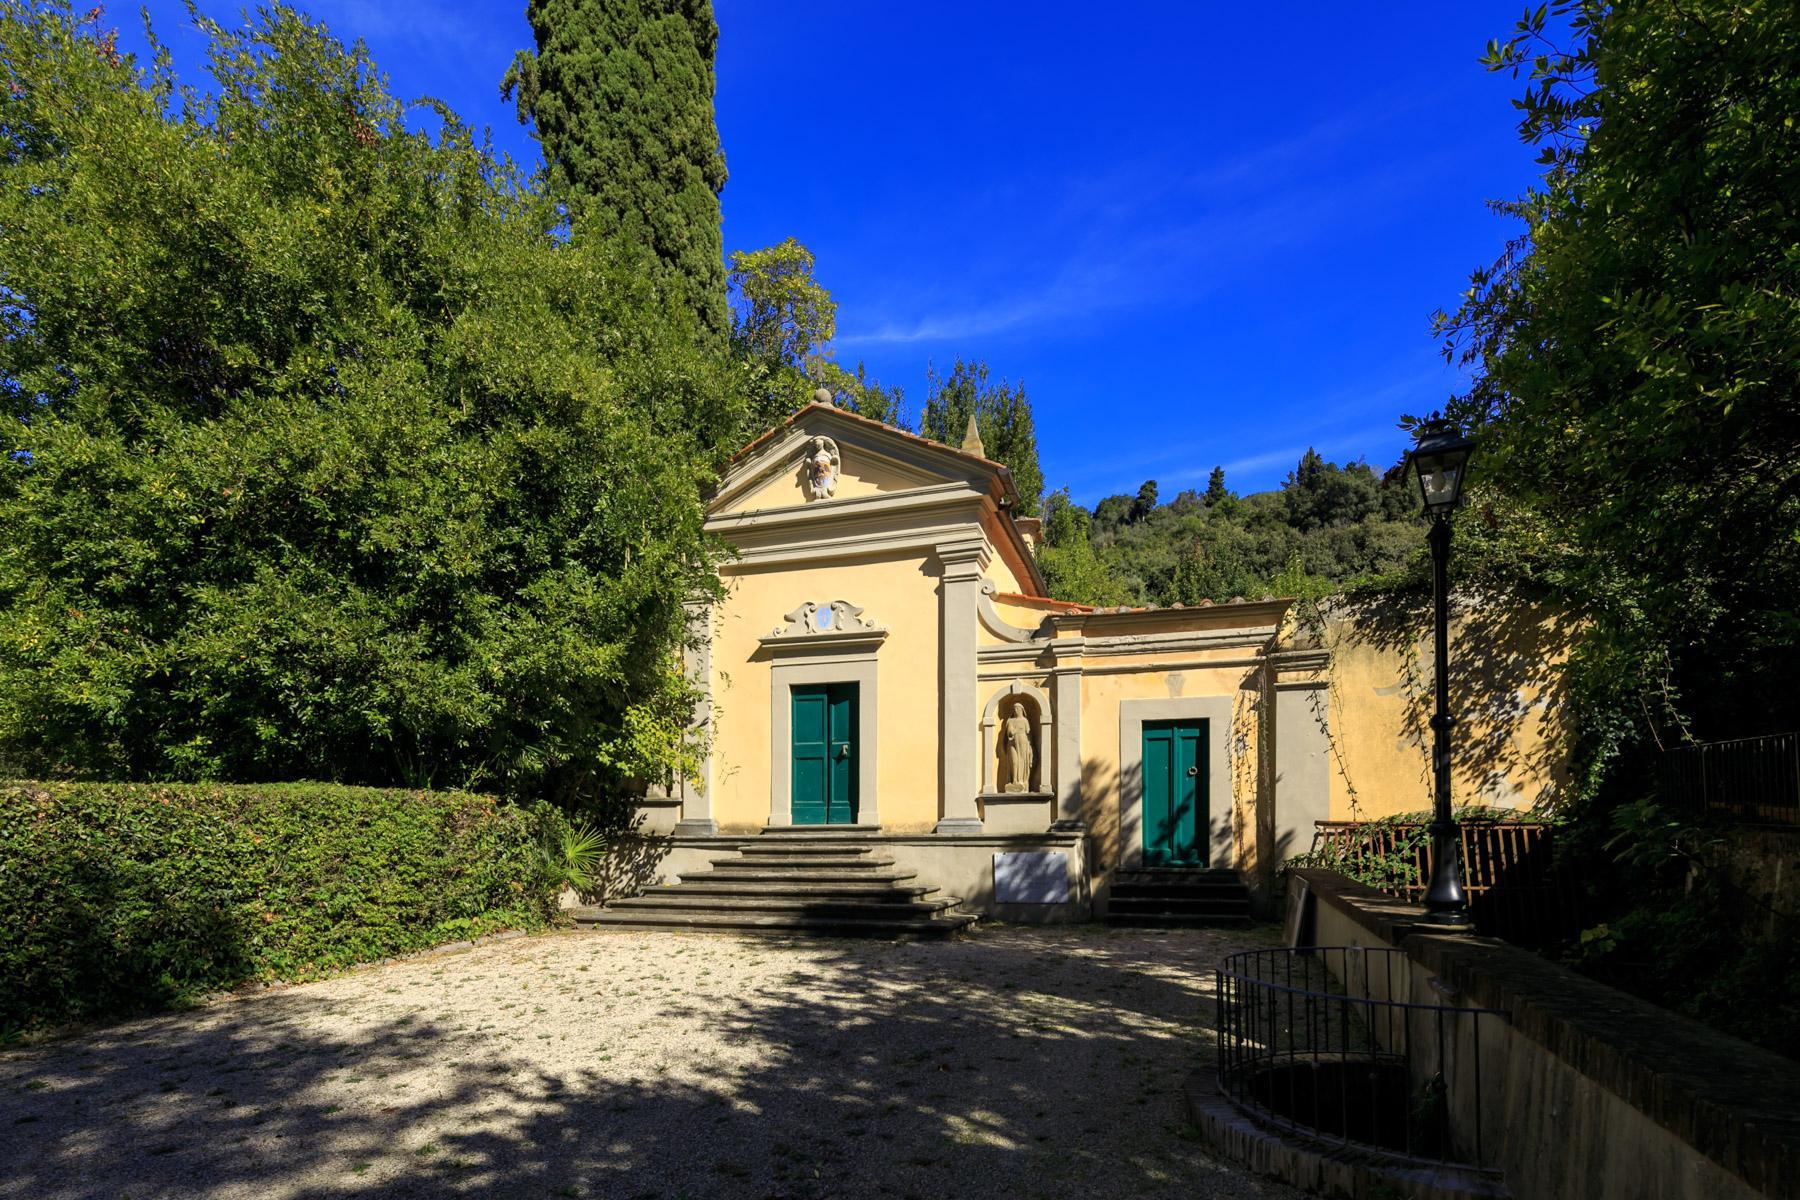 Exquisite 16th century property - 20